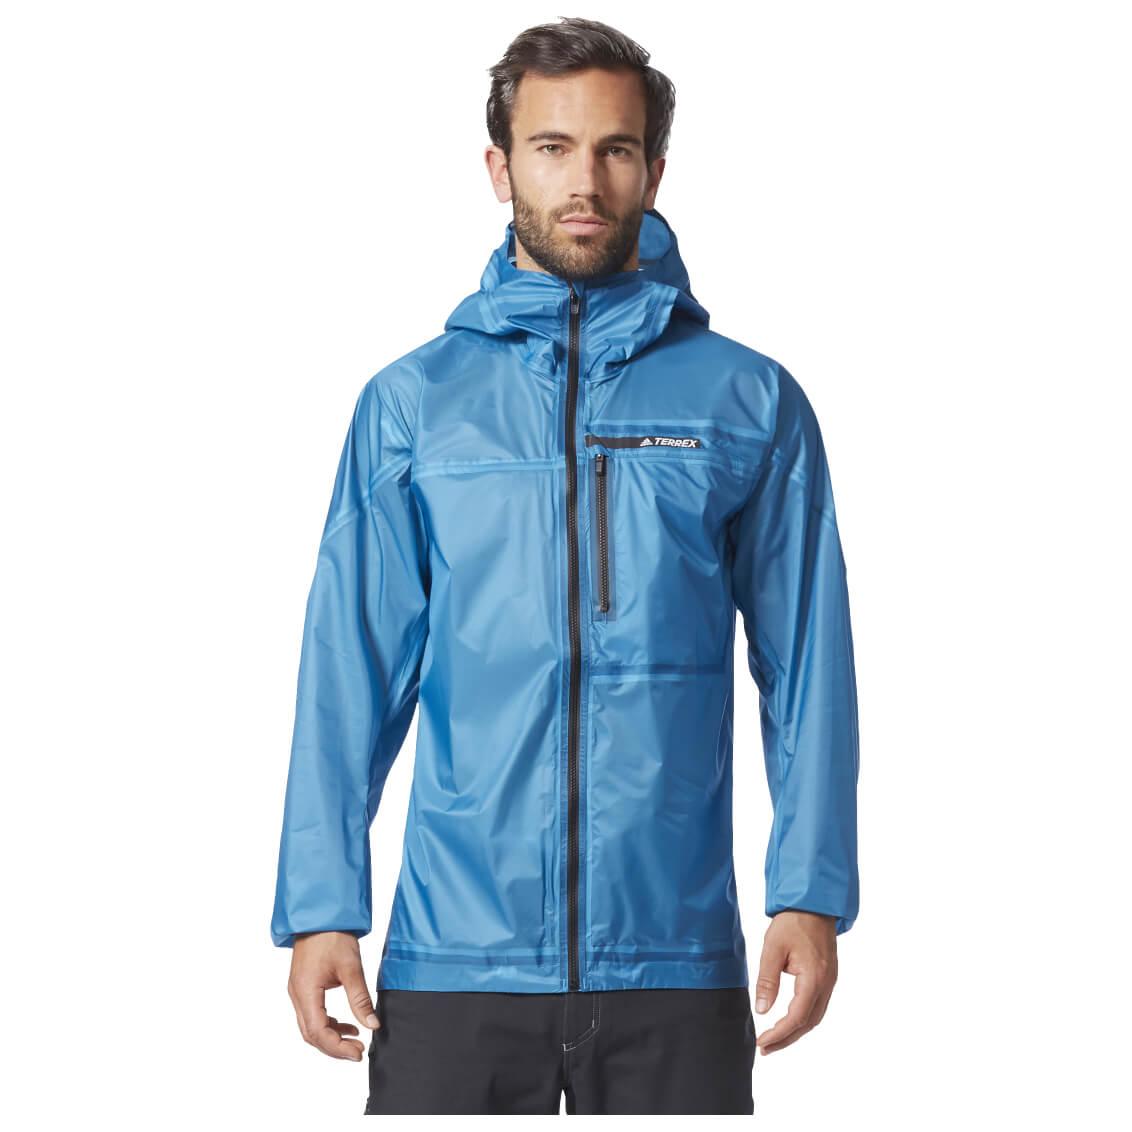 Adidas Terrex Agravic 3L Jacket Hardshell jacket Men's